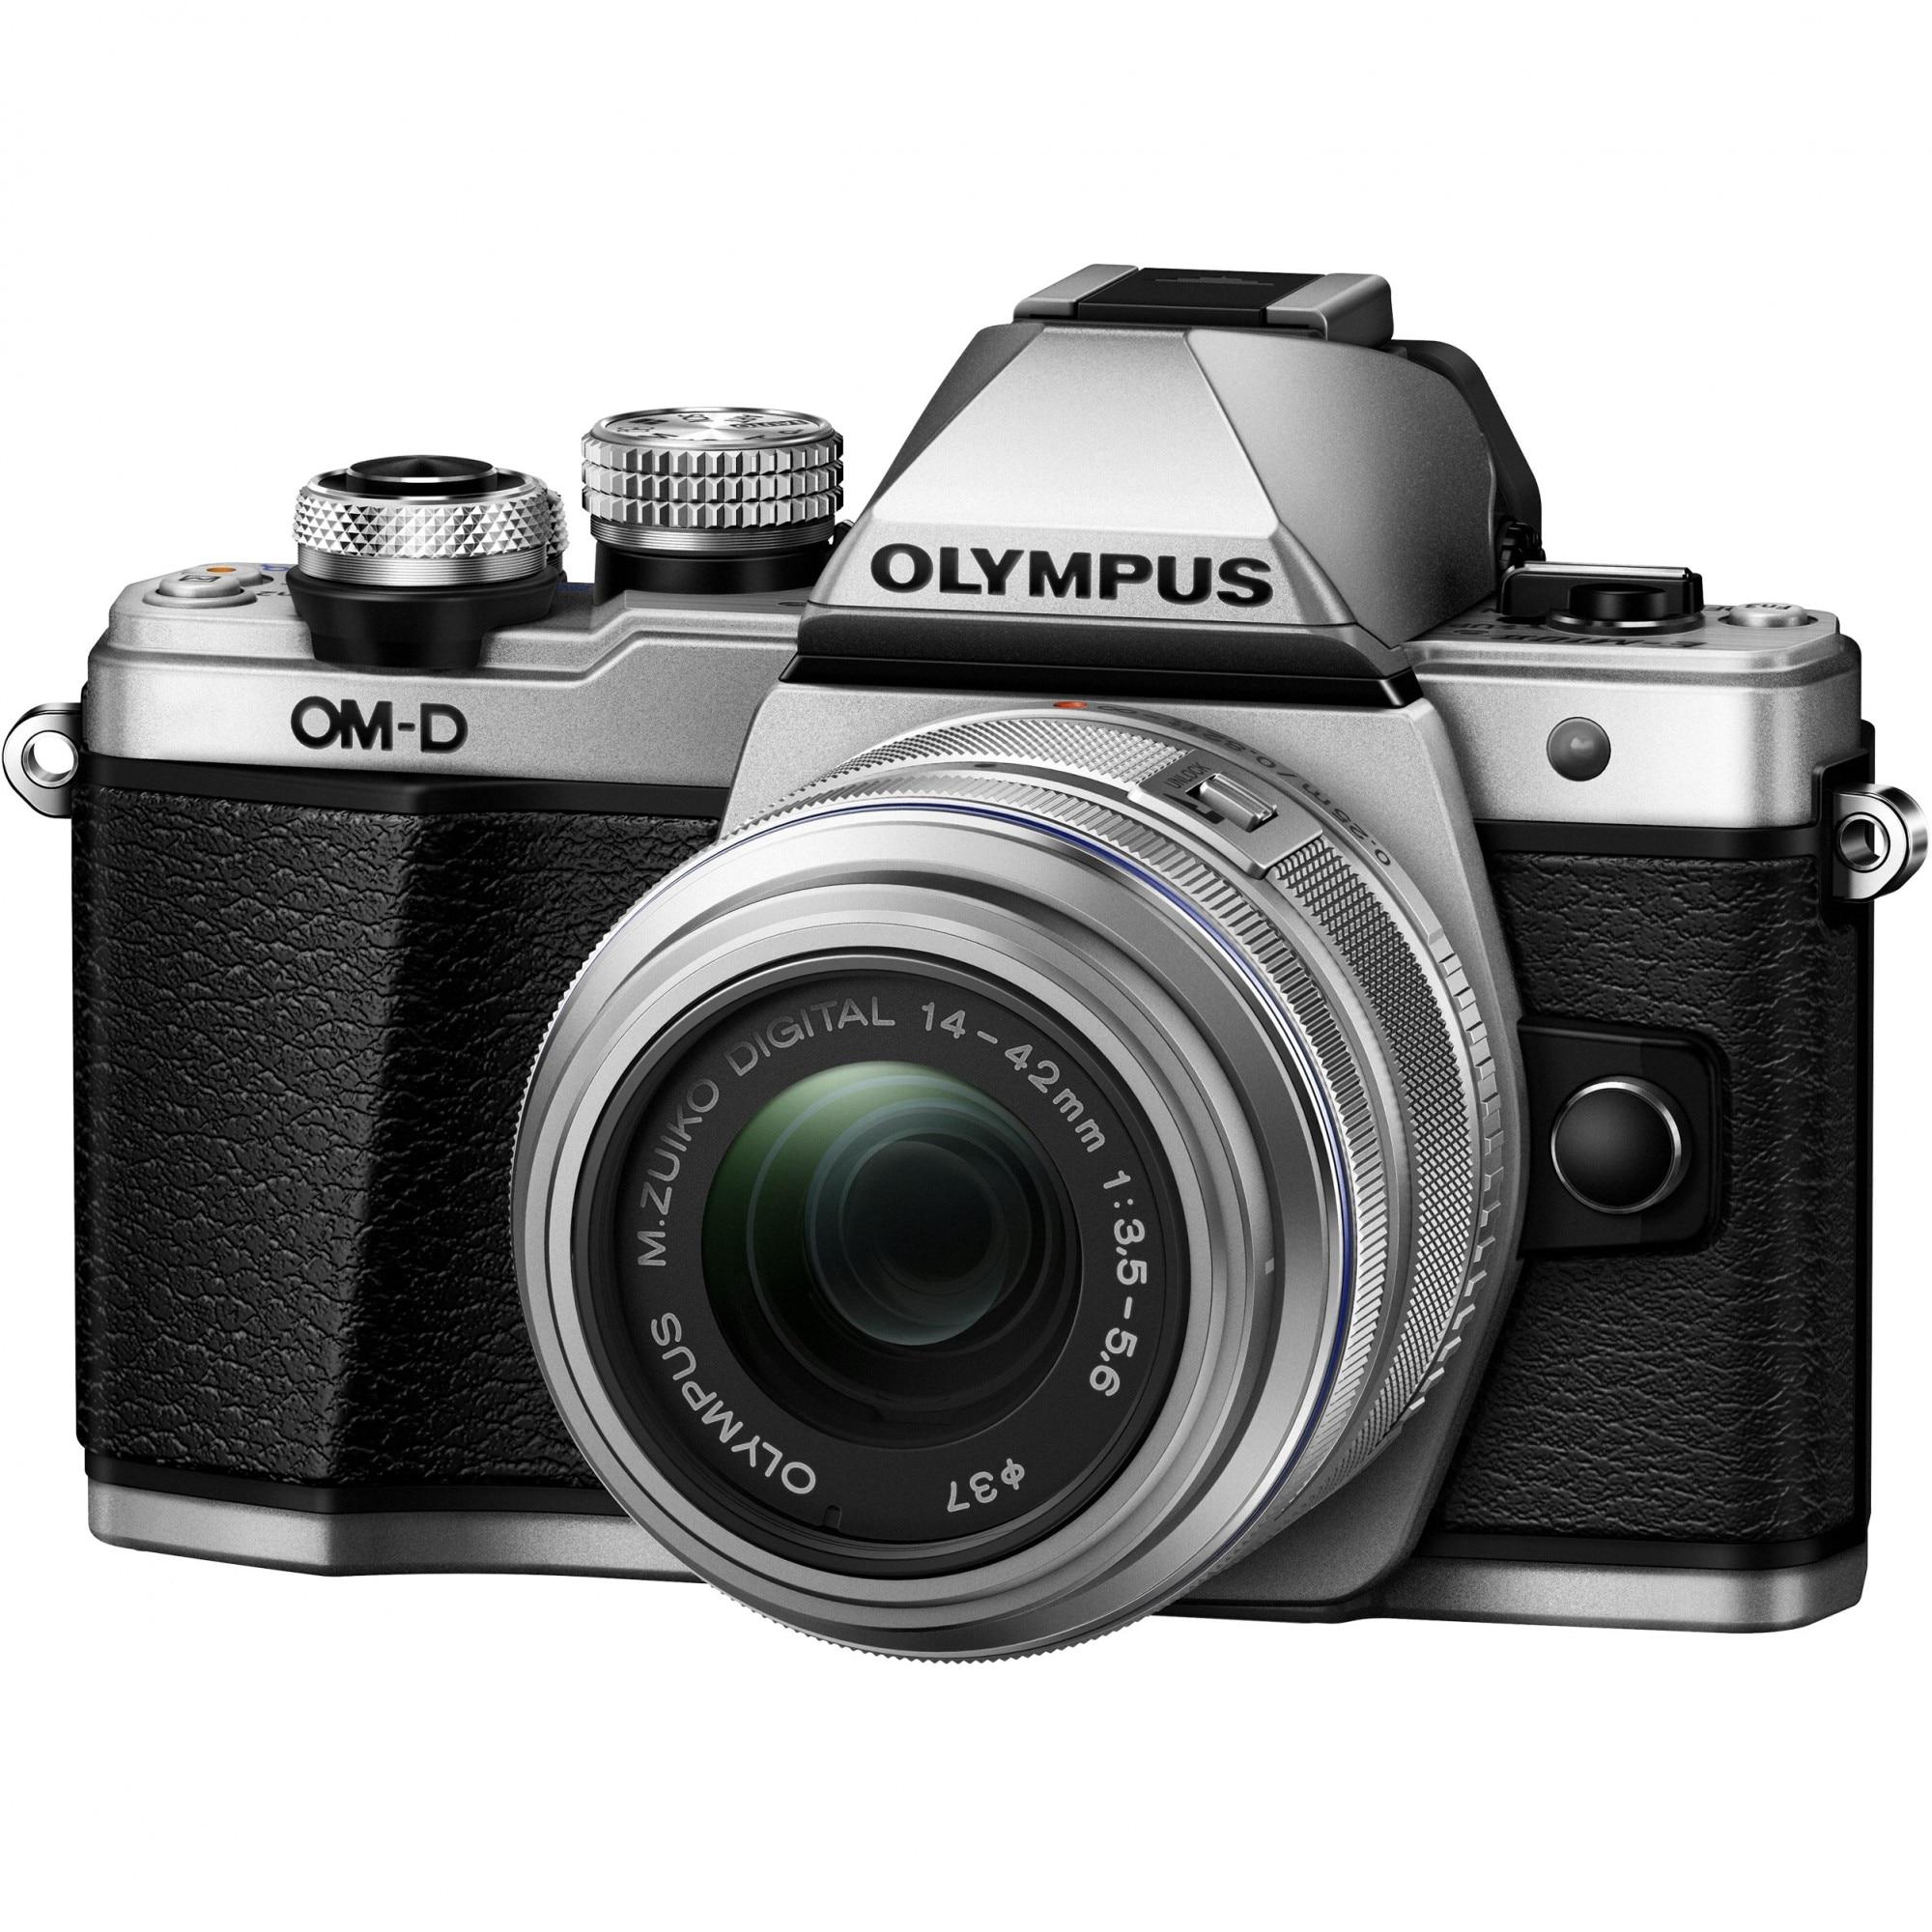 Fotografie Aparat foto mirrorless Olympus OM-D E-M10II 1442 IIR, Silver + Obiectiv 14-42mm EZ-M1442 IIR, Silver